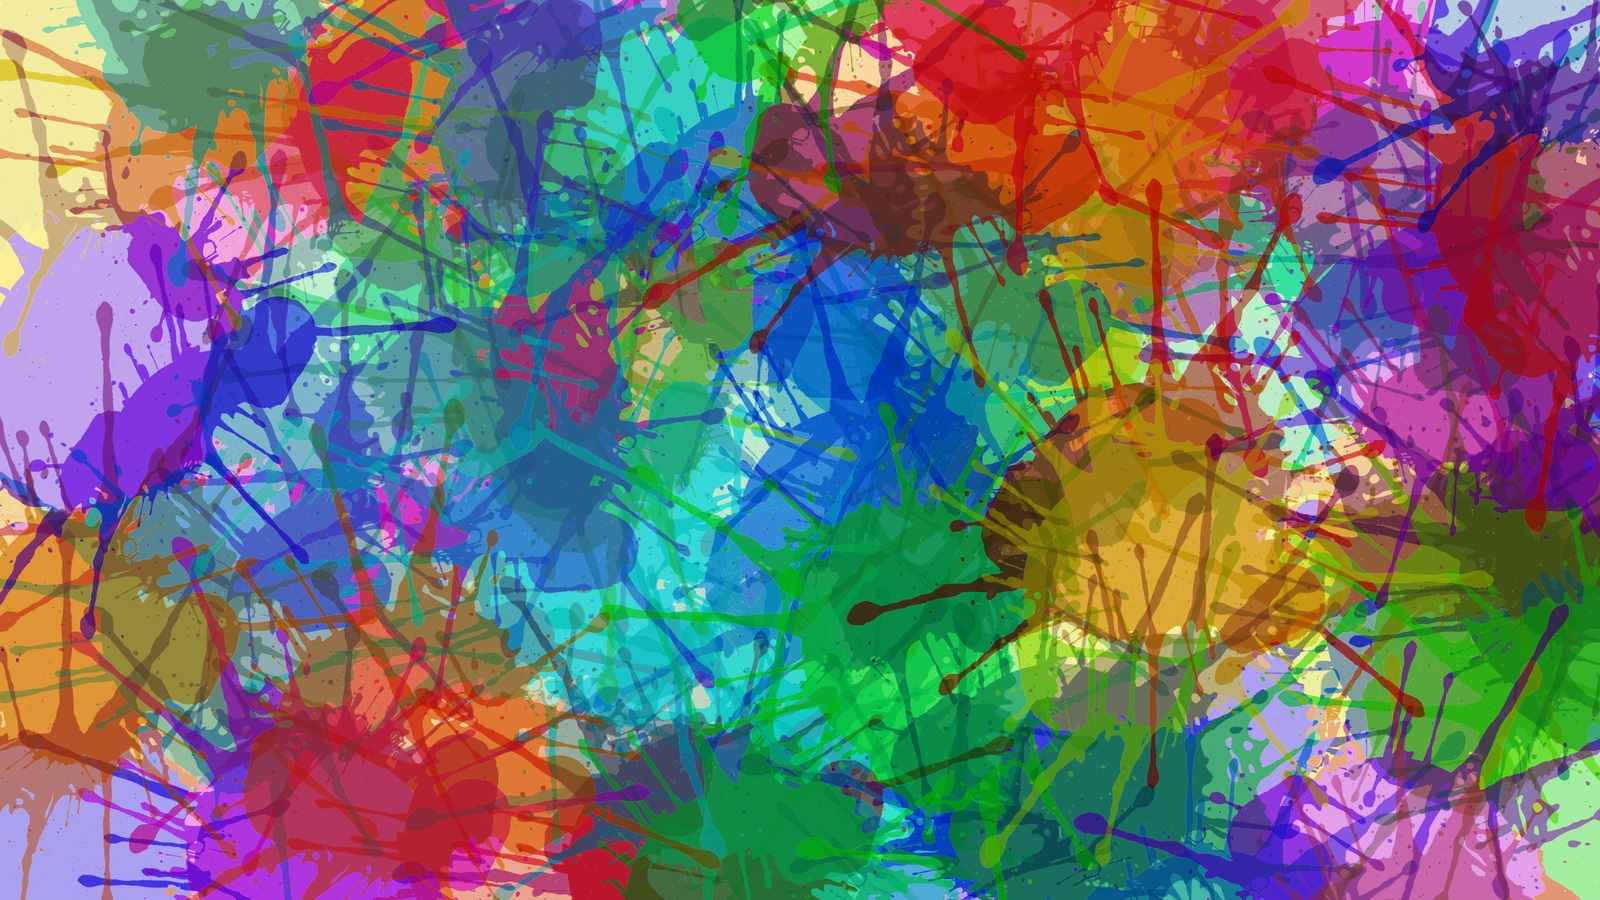 abstract-colors-4k-5k-ed.jpg